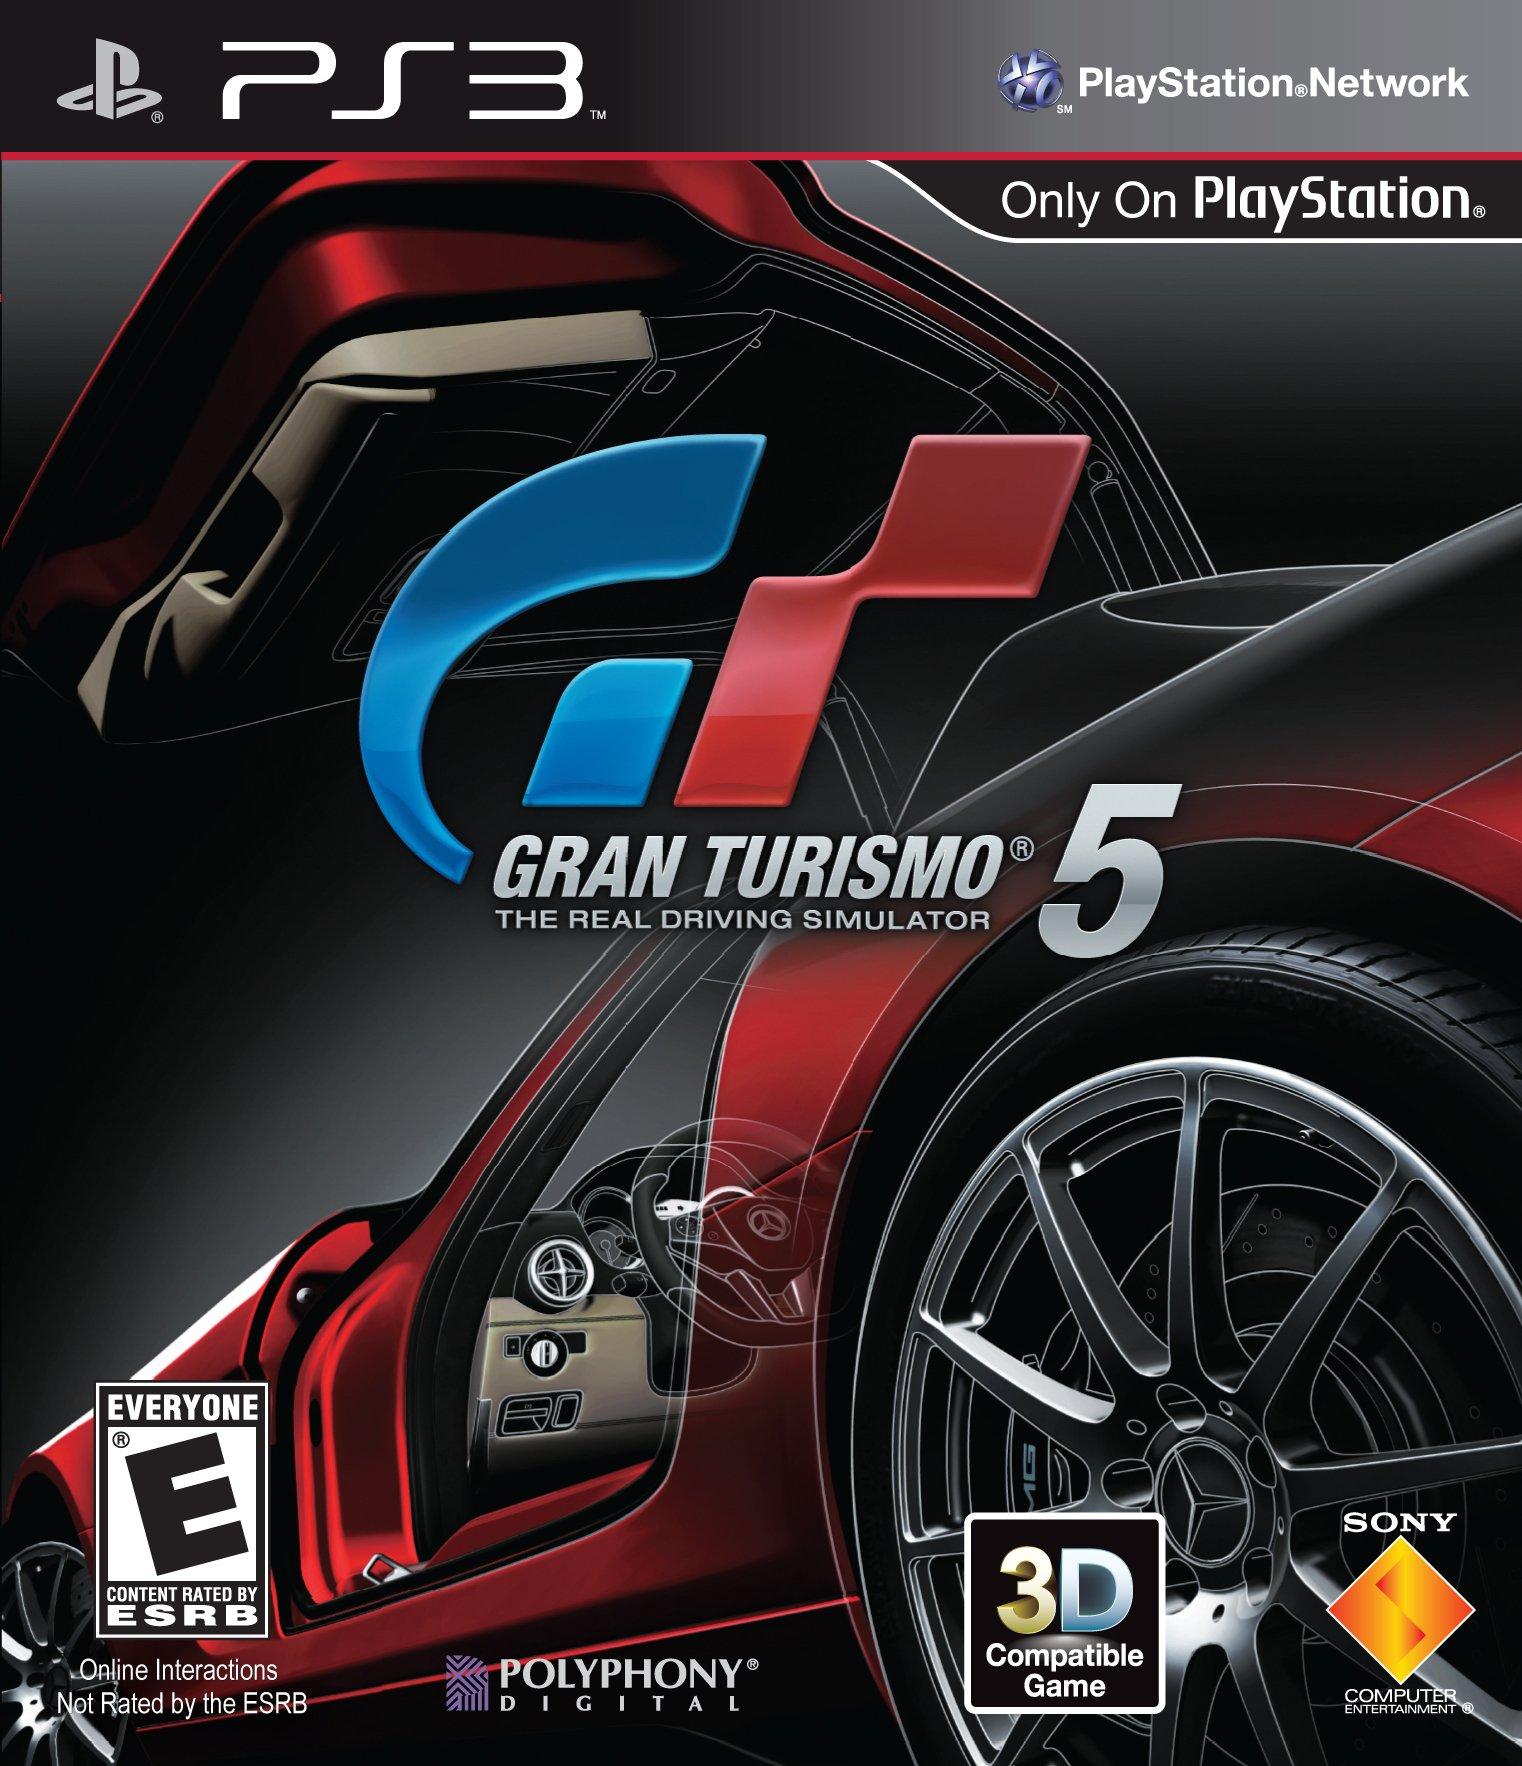 Gran Turismo 5 - Playstation 3